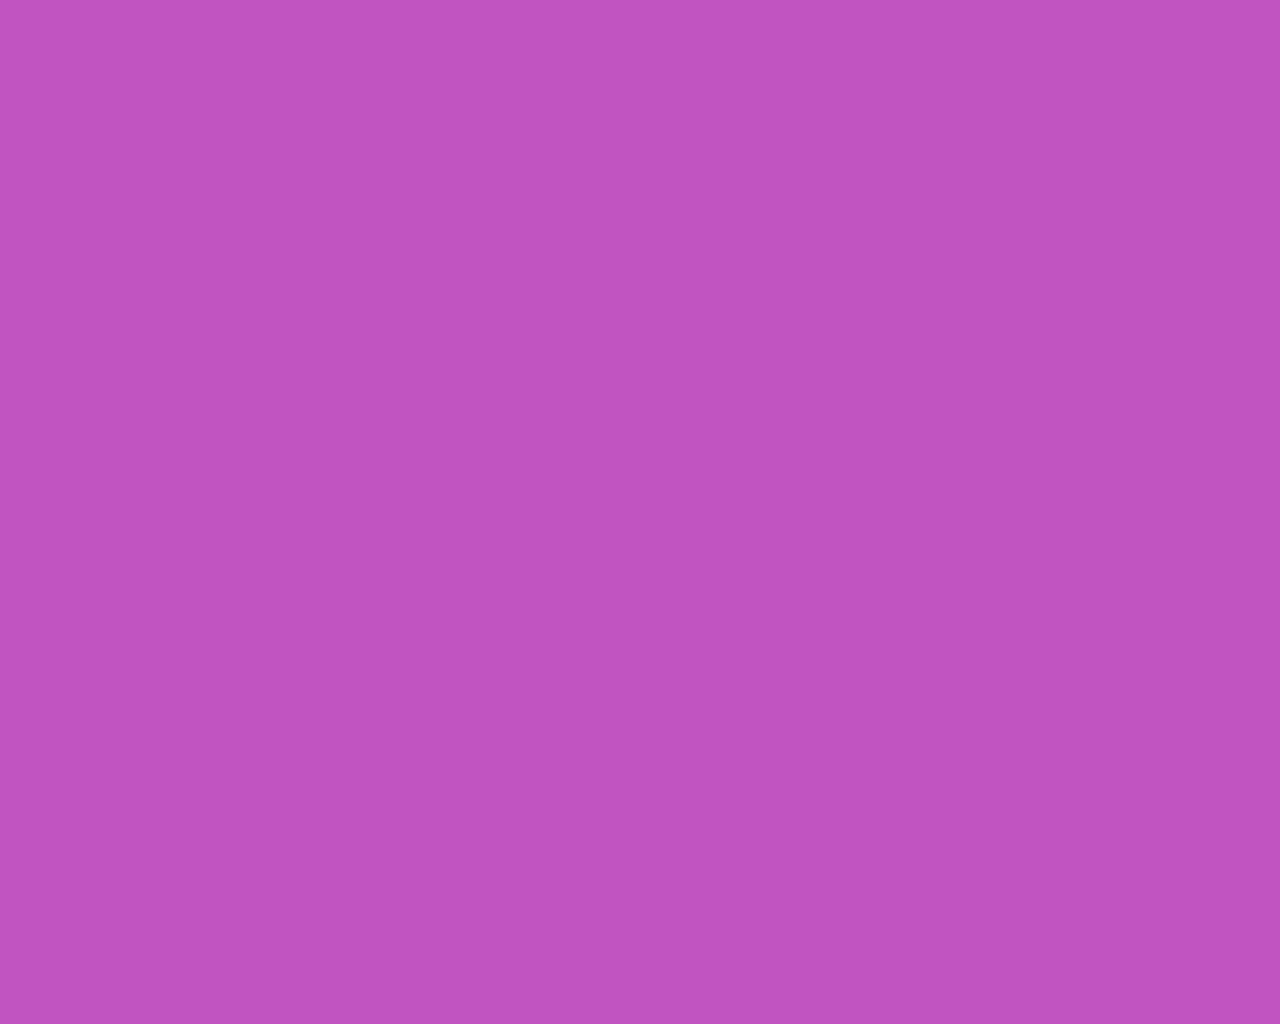 1280x1024 Fuchsia Crayola Solid Color Background